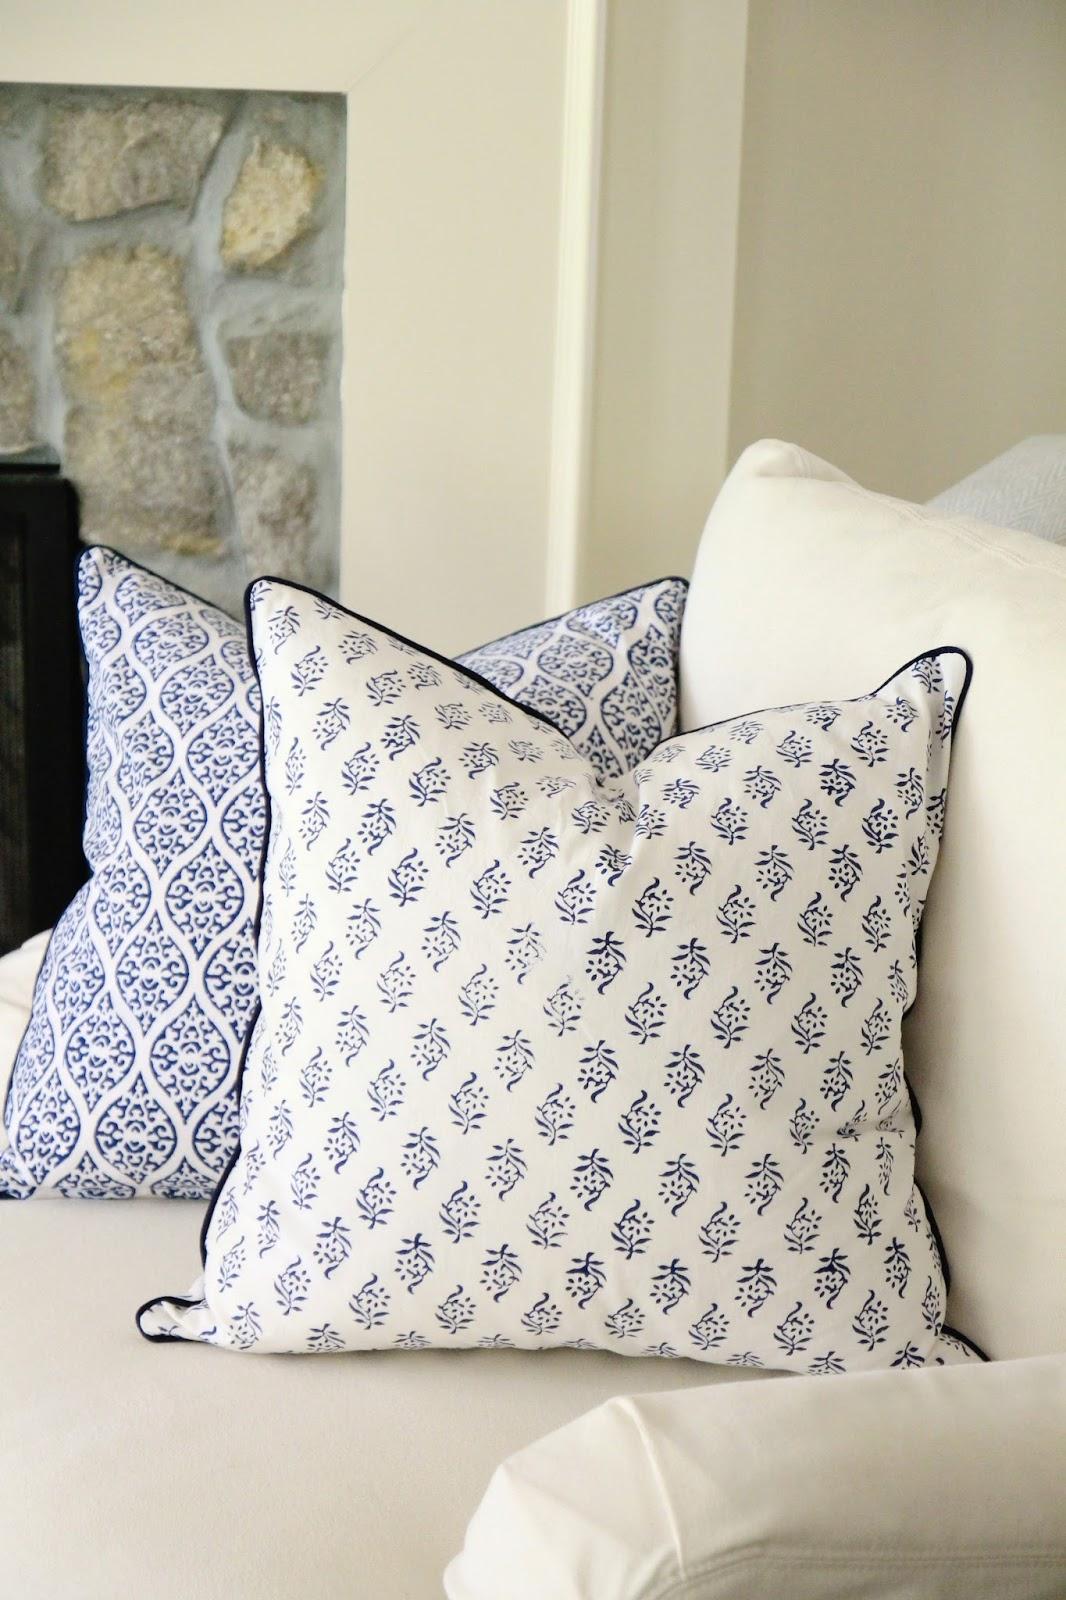 Jenny Steffens Hobick: Indigo Woodblock Print Napkins & Pillows ...